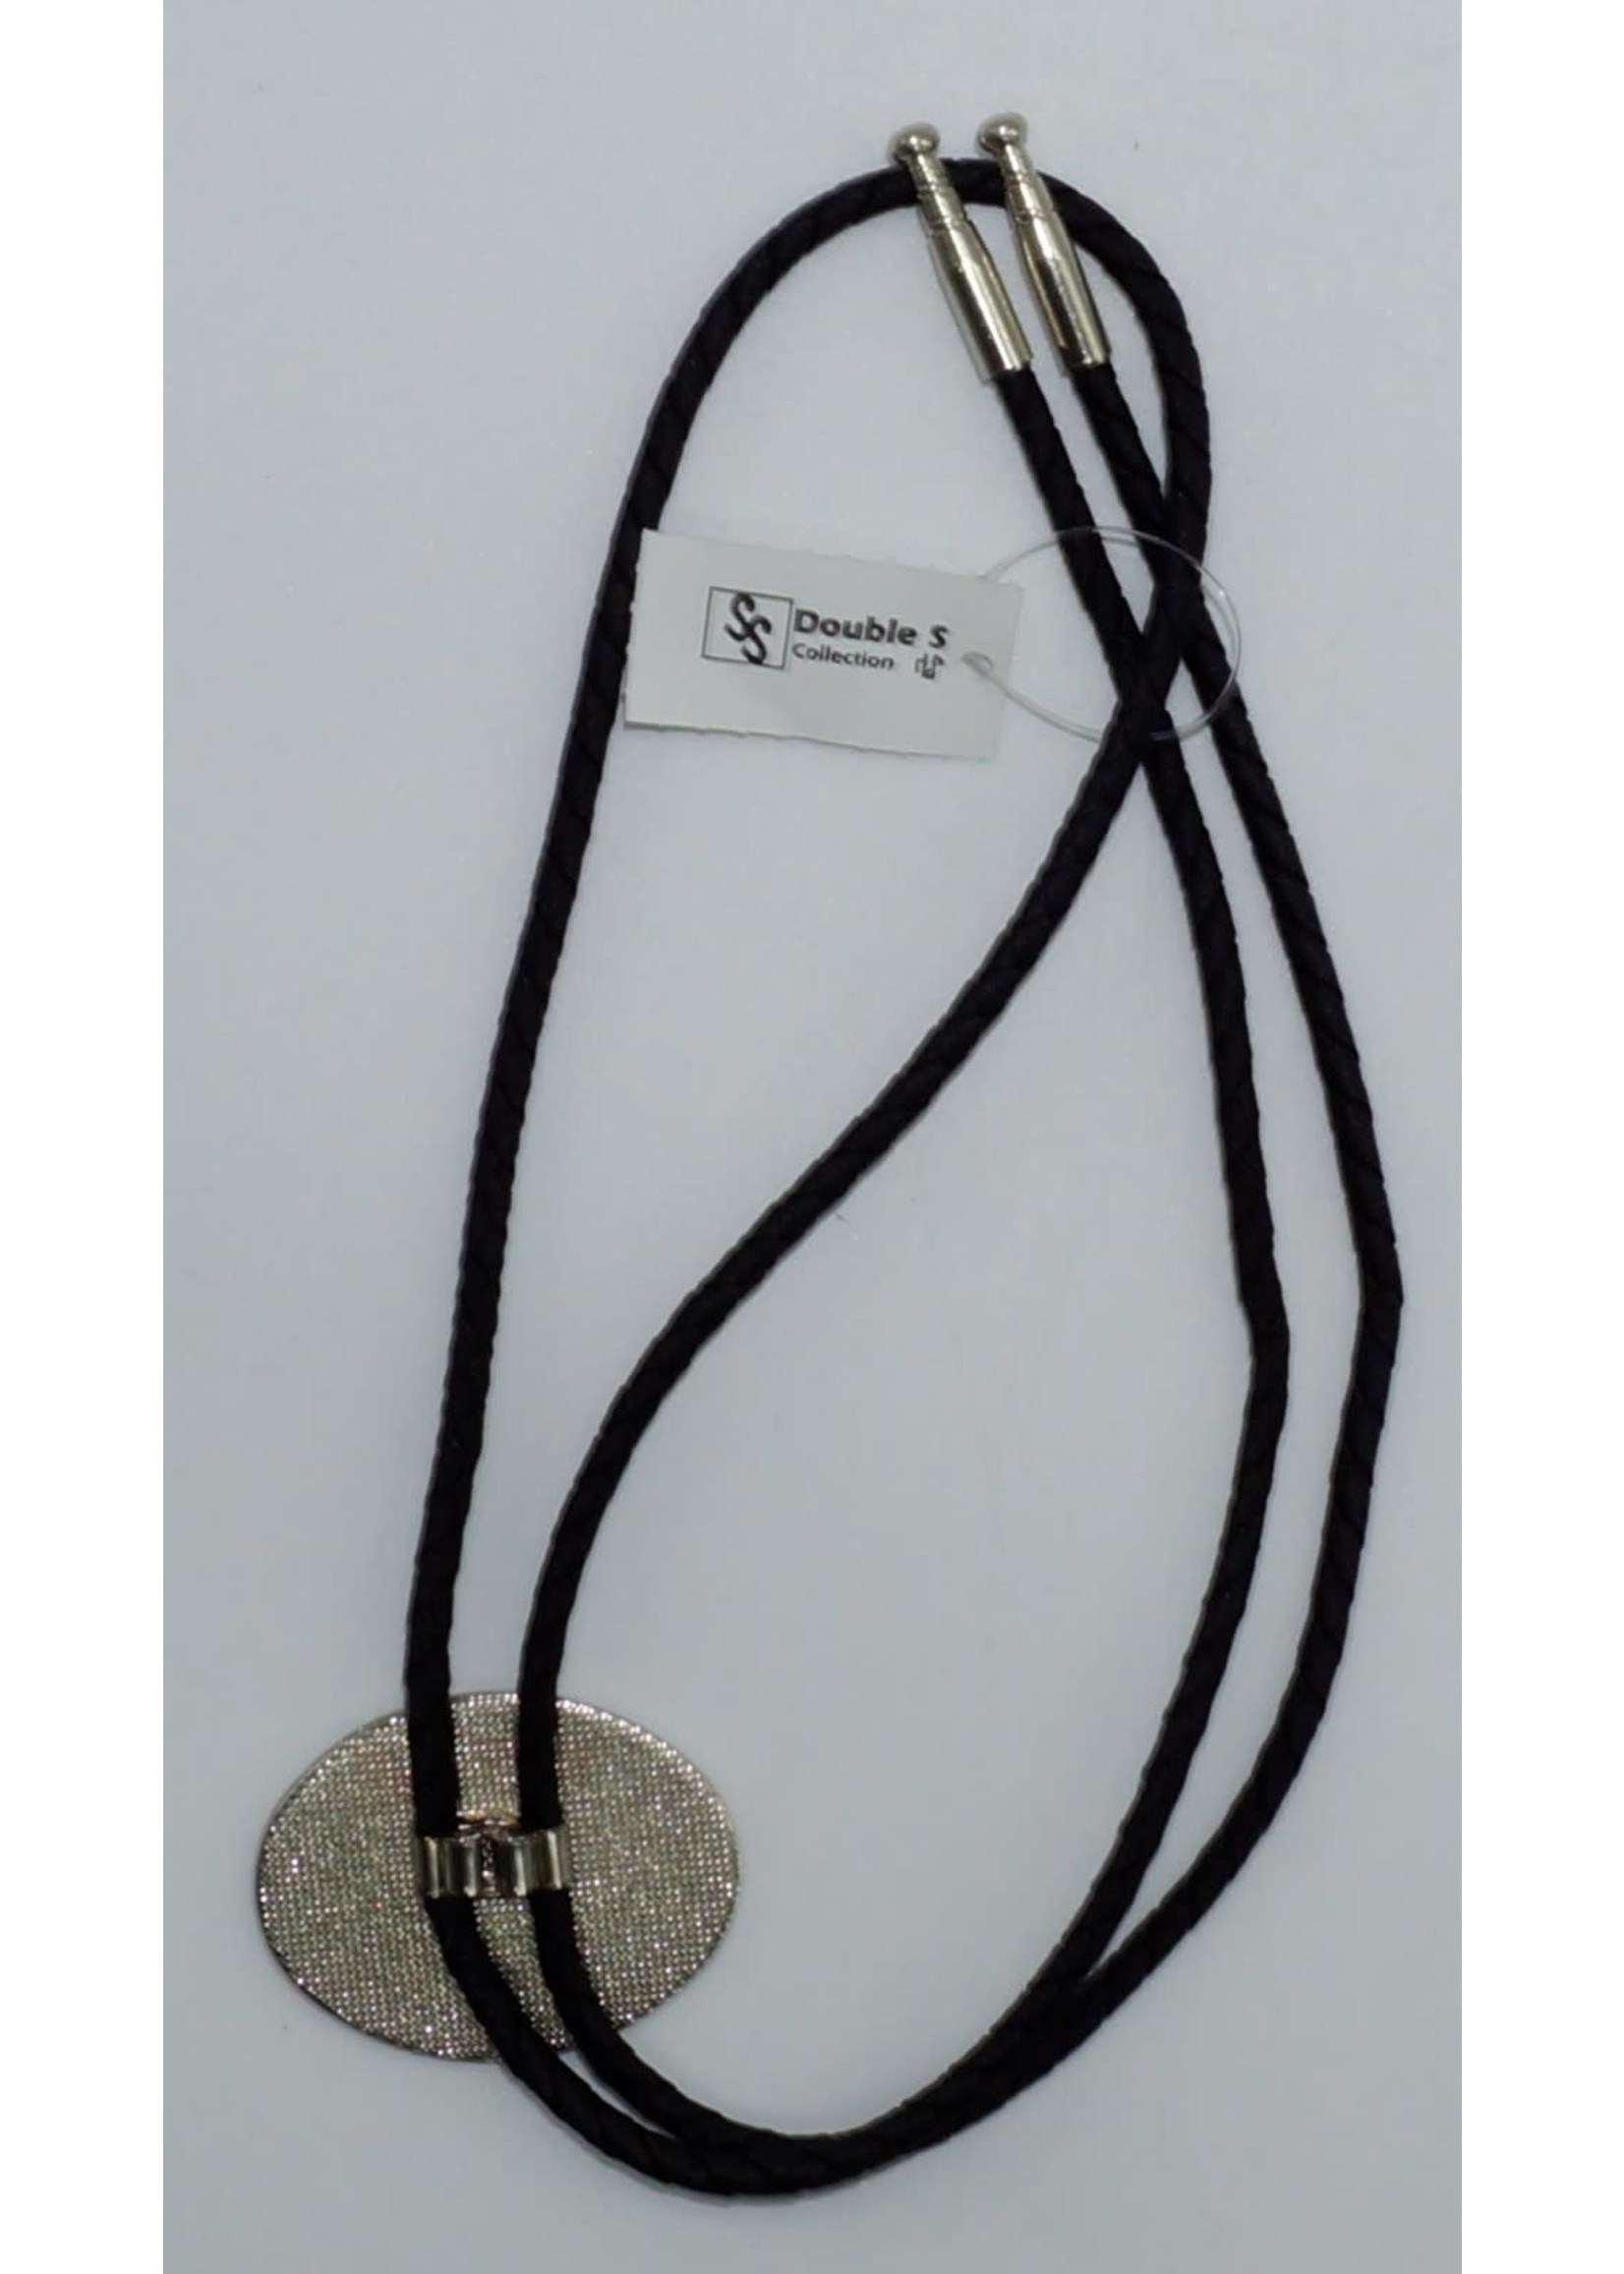 M&F 22306- Silver Texas Seal